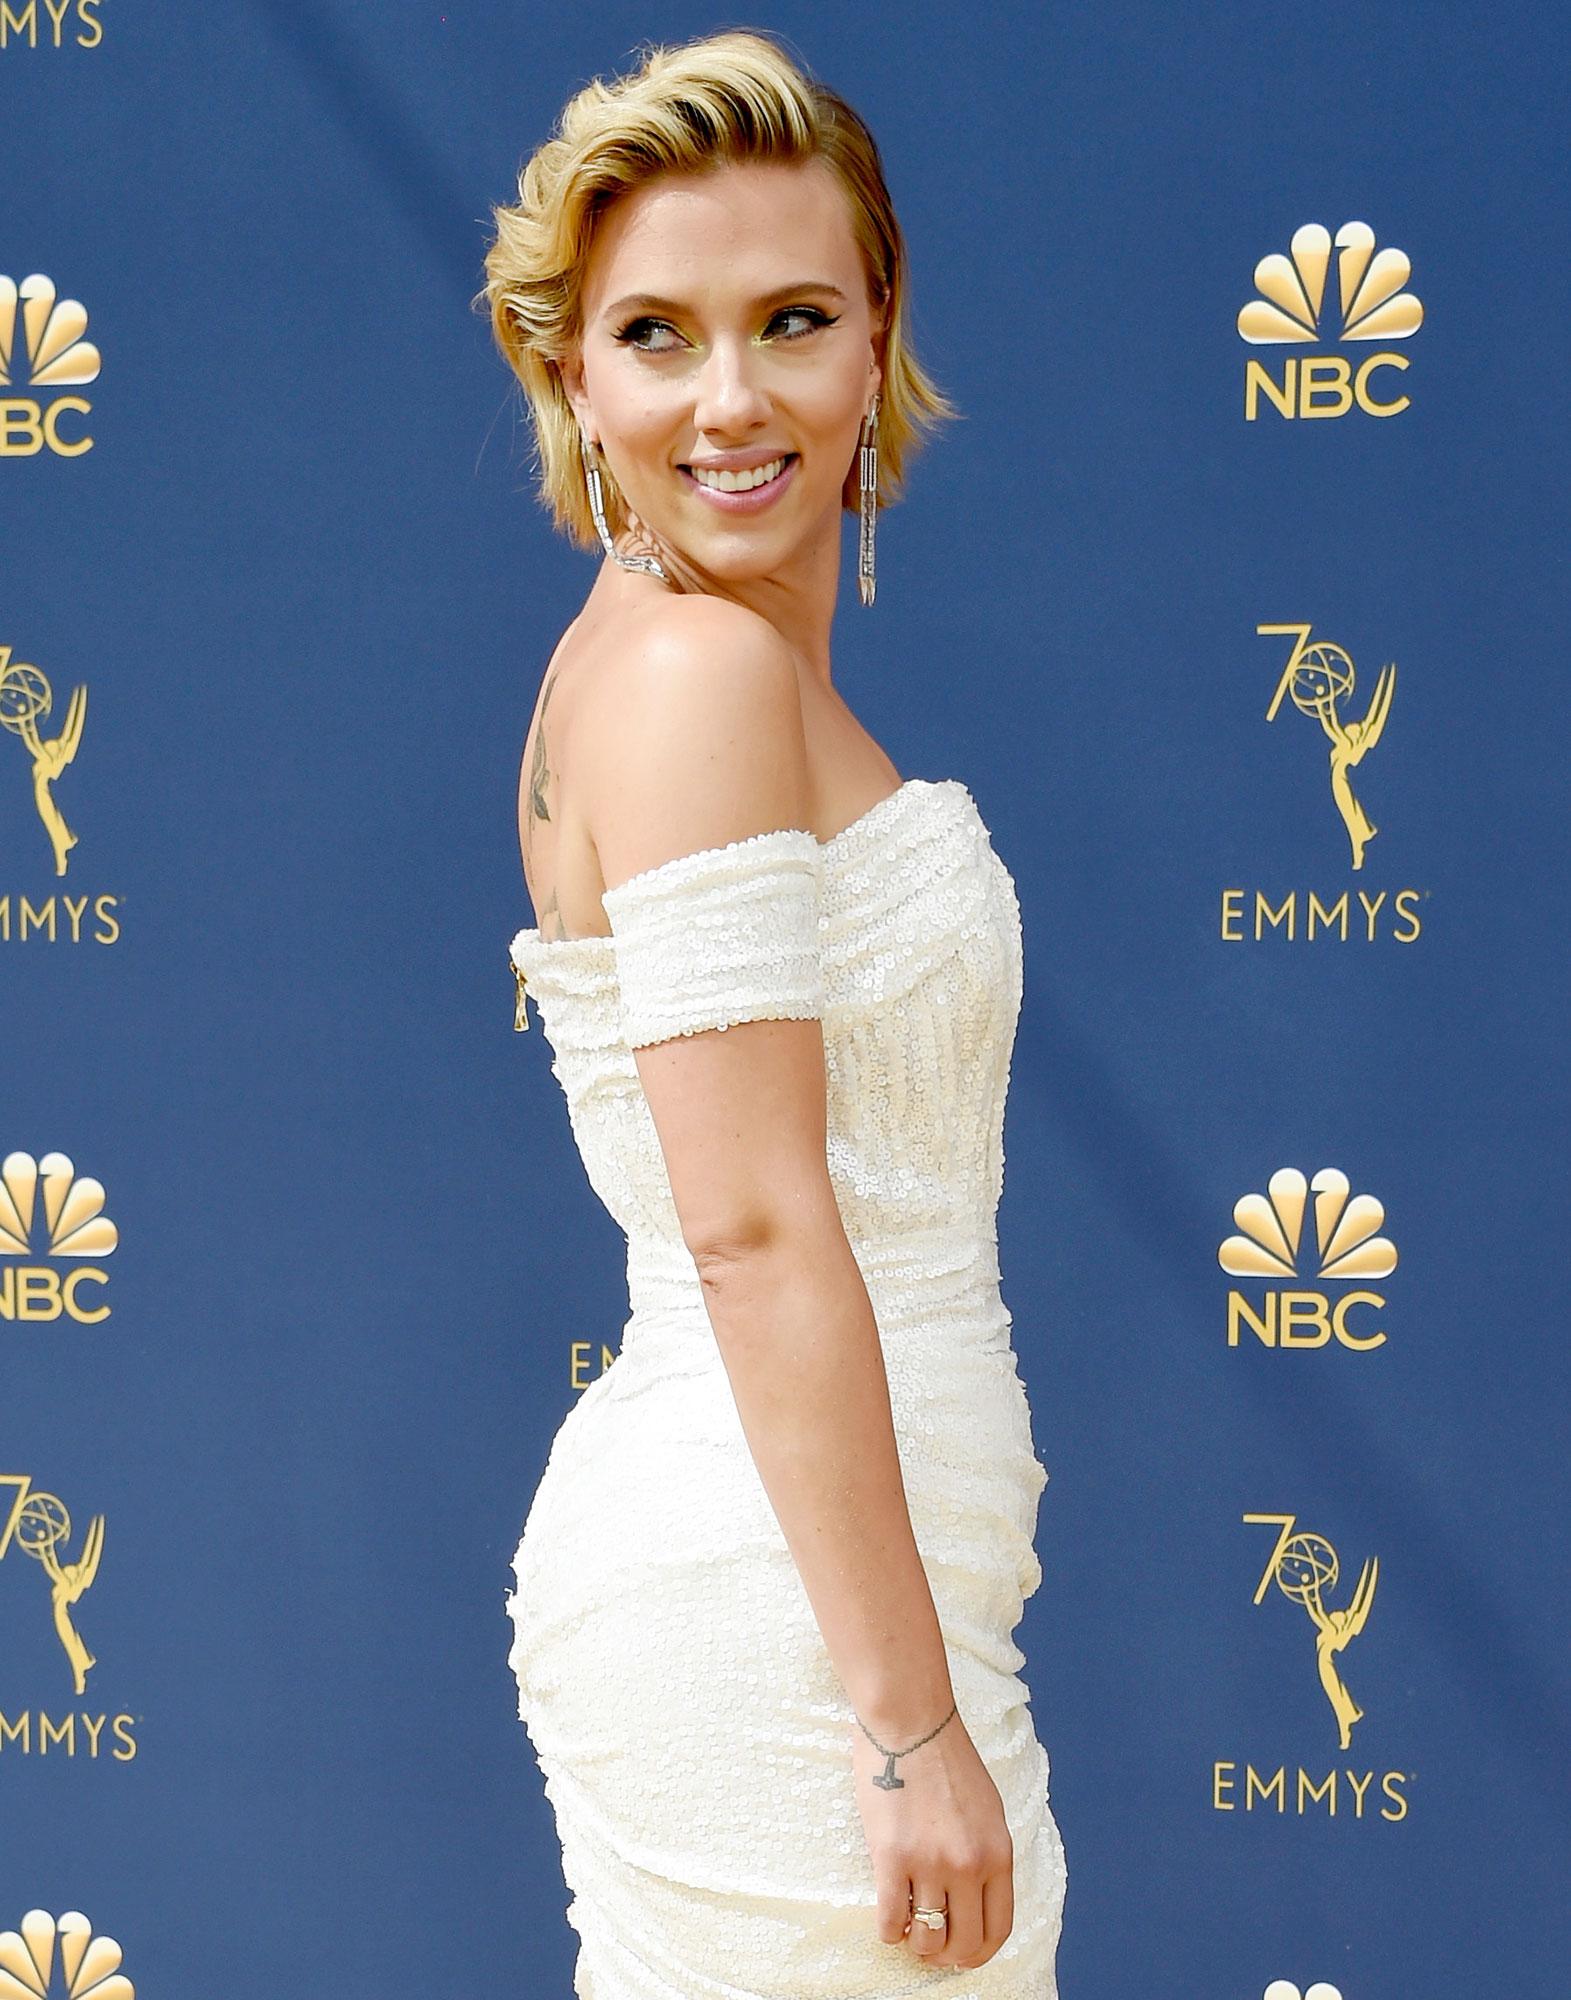 ba2f8d6c7ea0f Scarlett Johansson's Trainer: How to Restart Weight Loss Resolutions